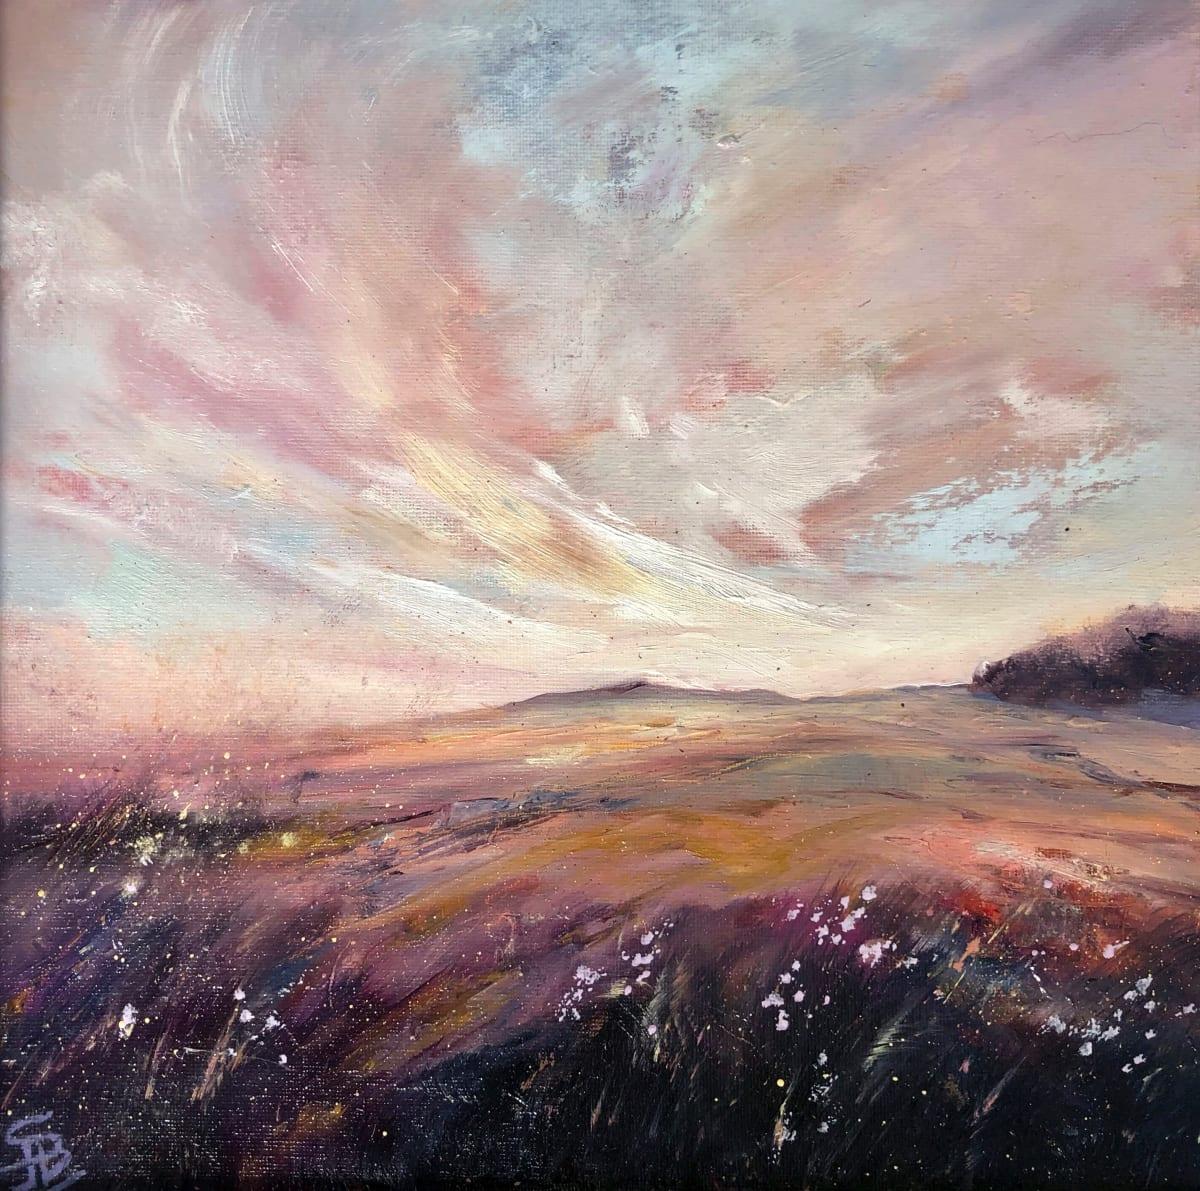 Lingering longer by Sarah Jane Brown